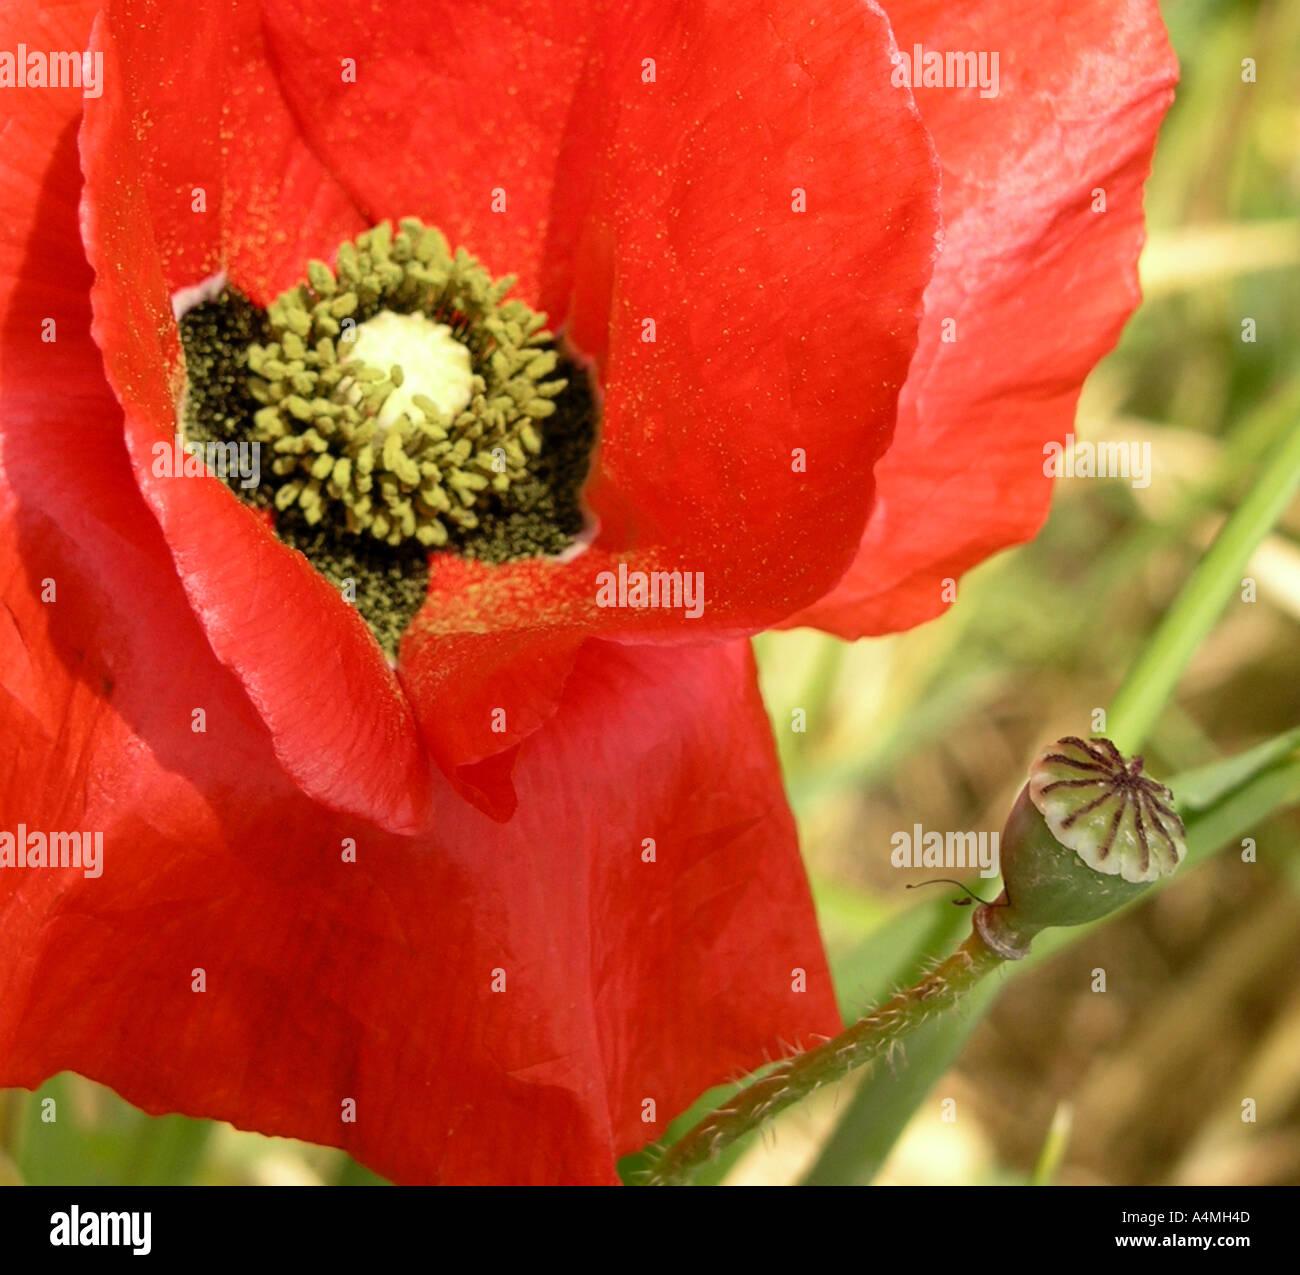 Red Common Wild Poppy Flower Latin Name Is Papaver Stock Photo